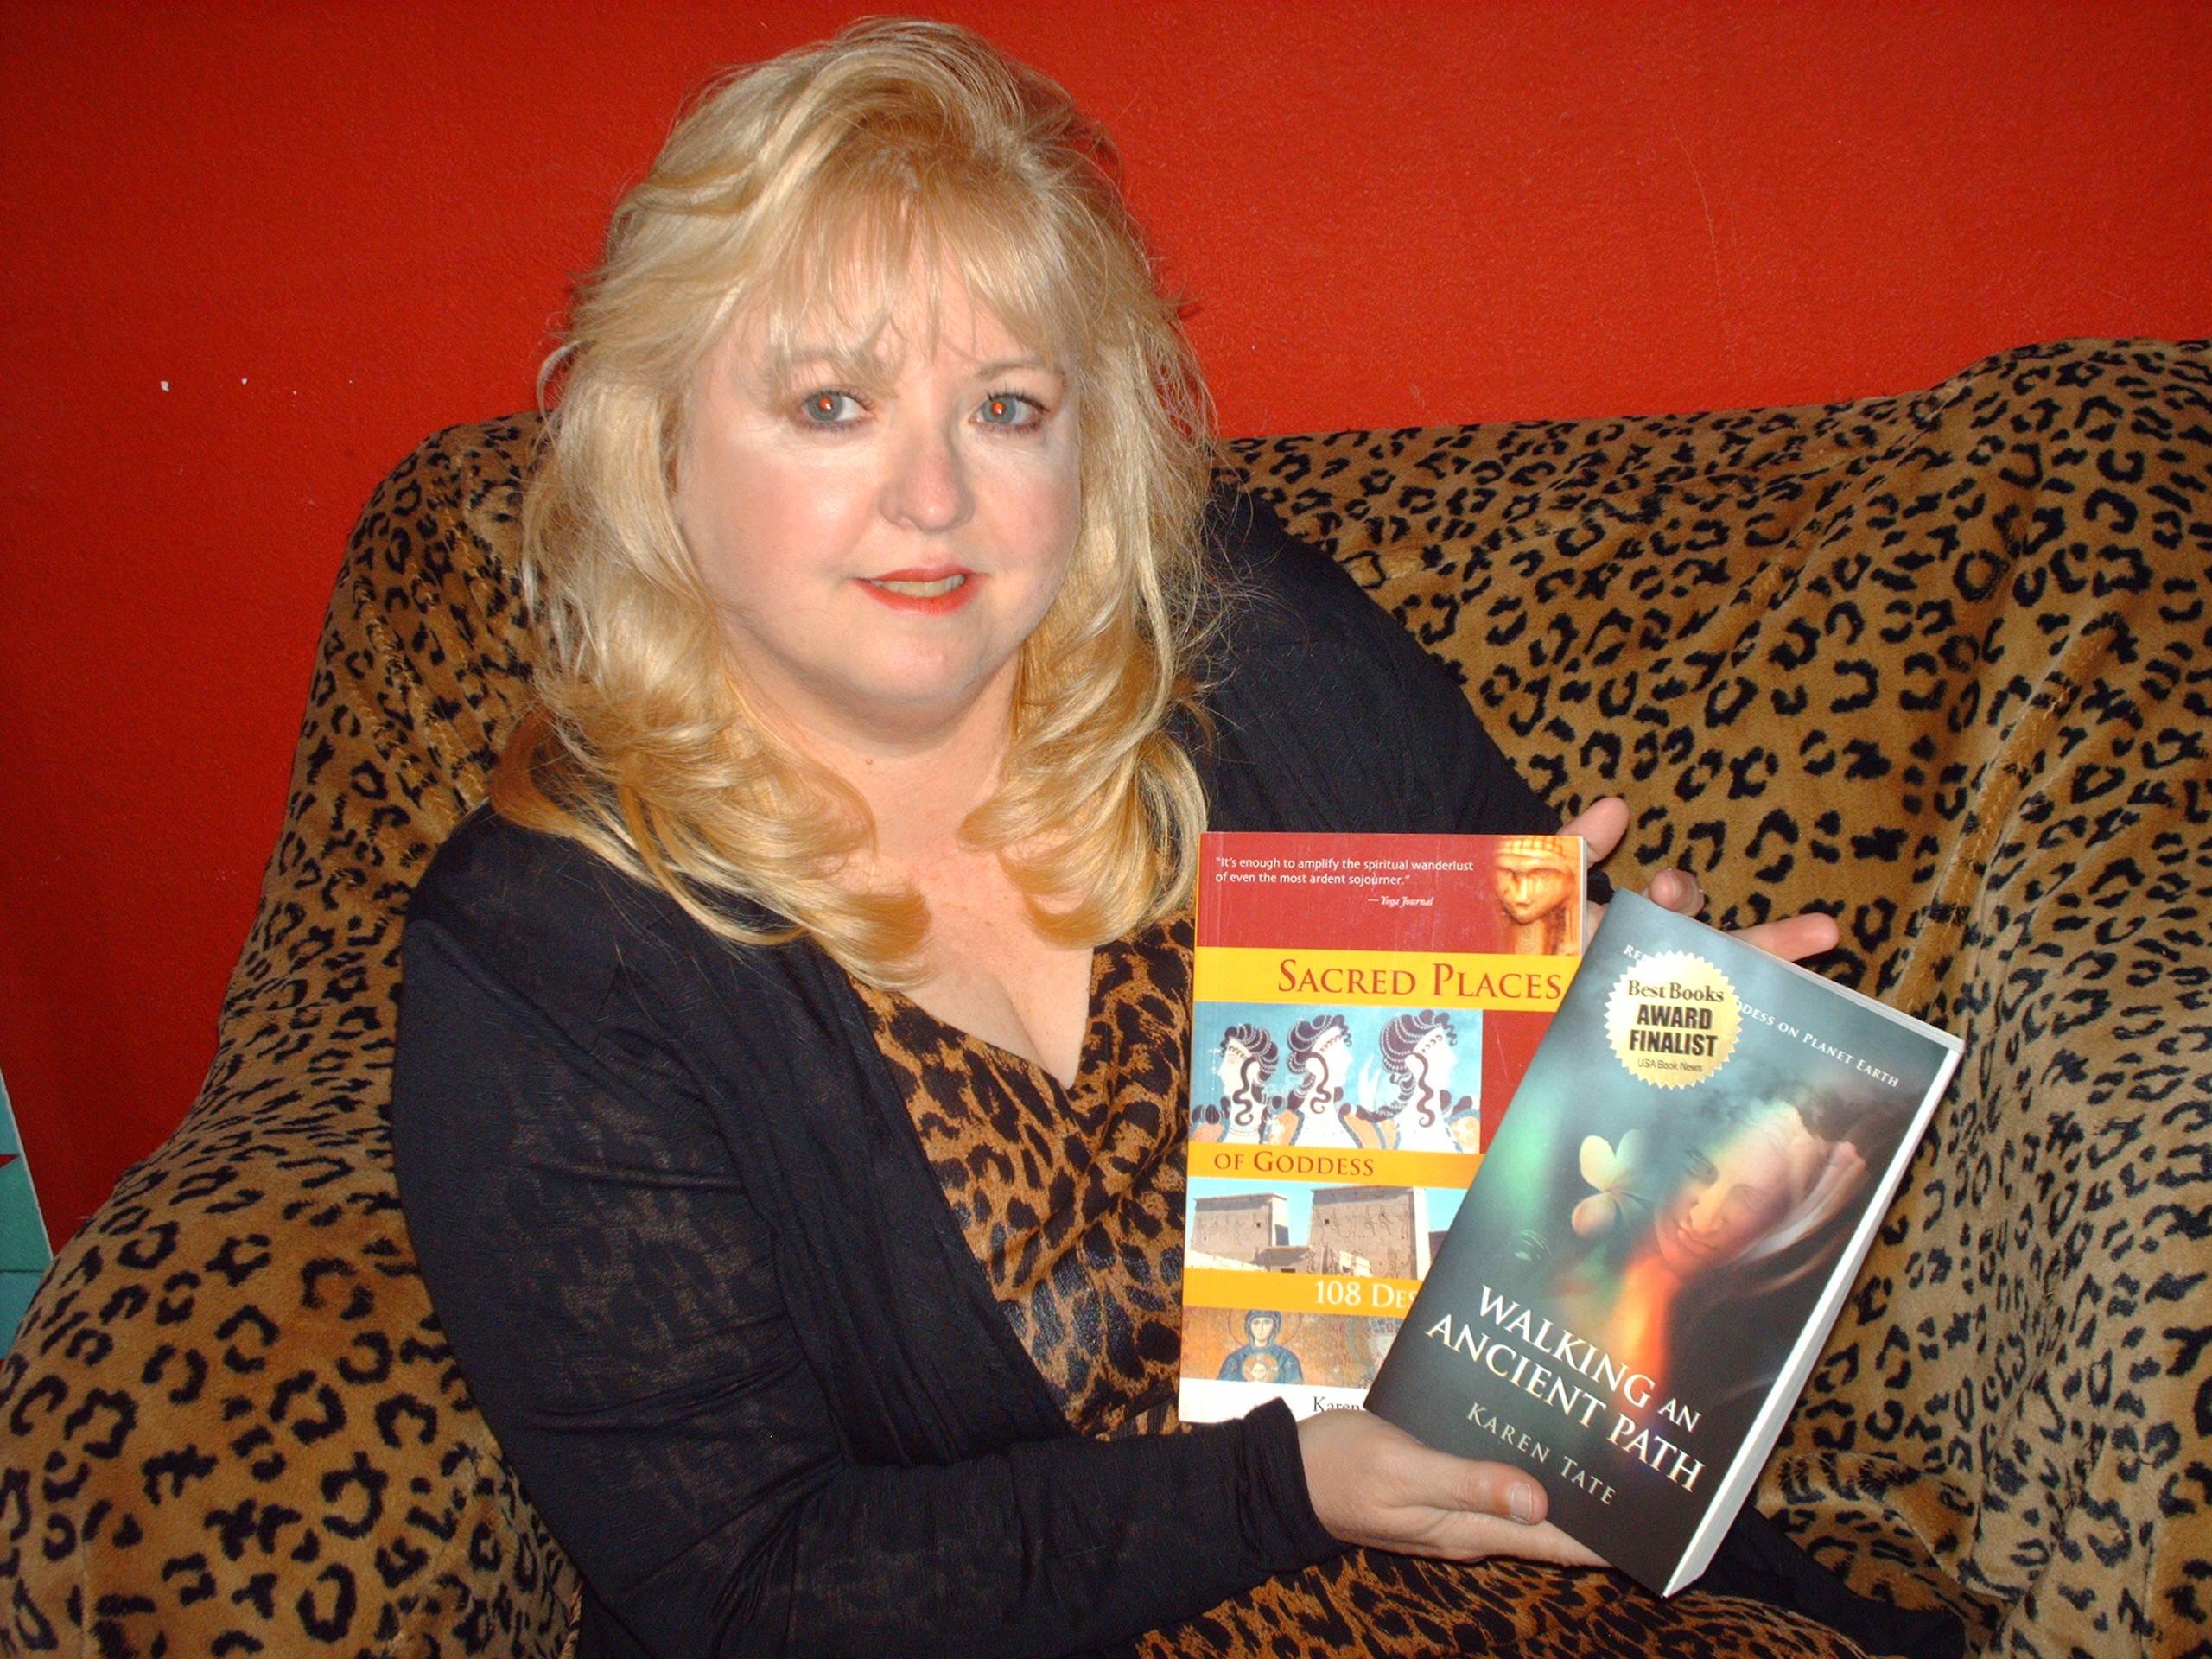 Karen with books